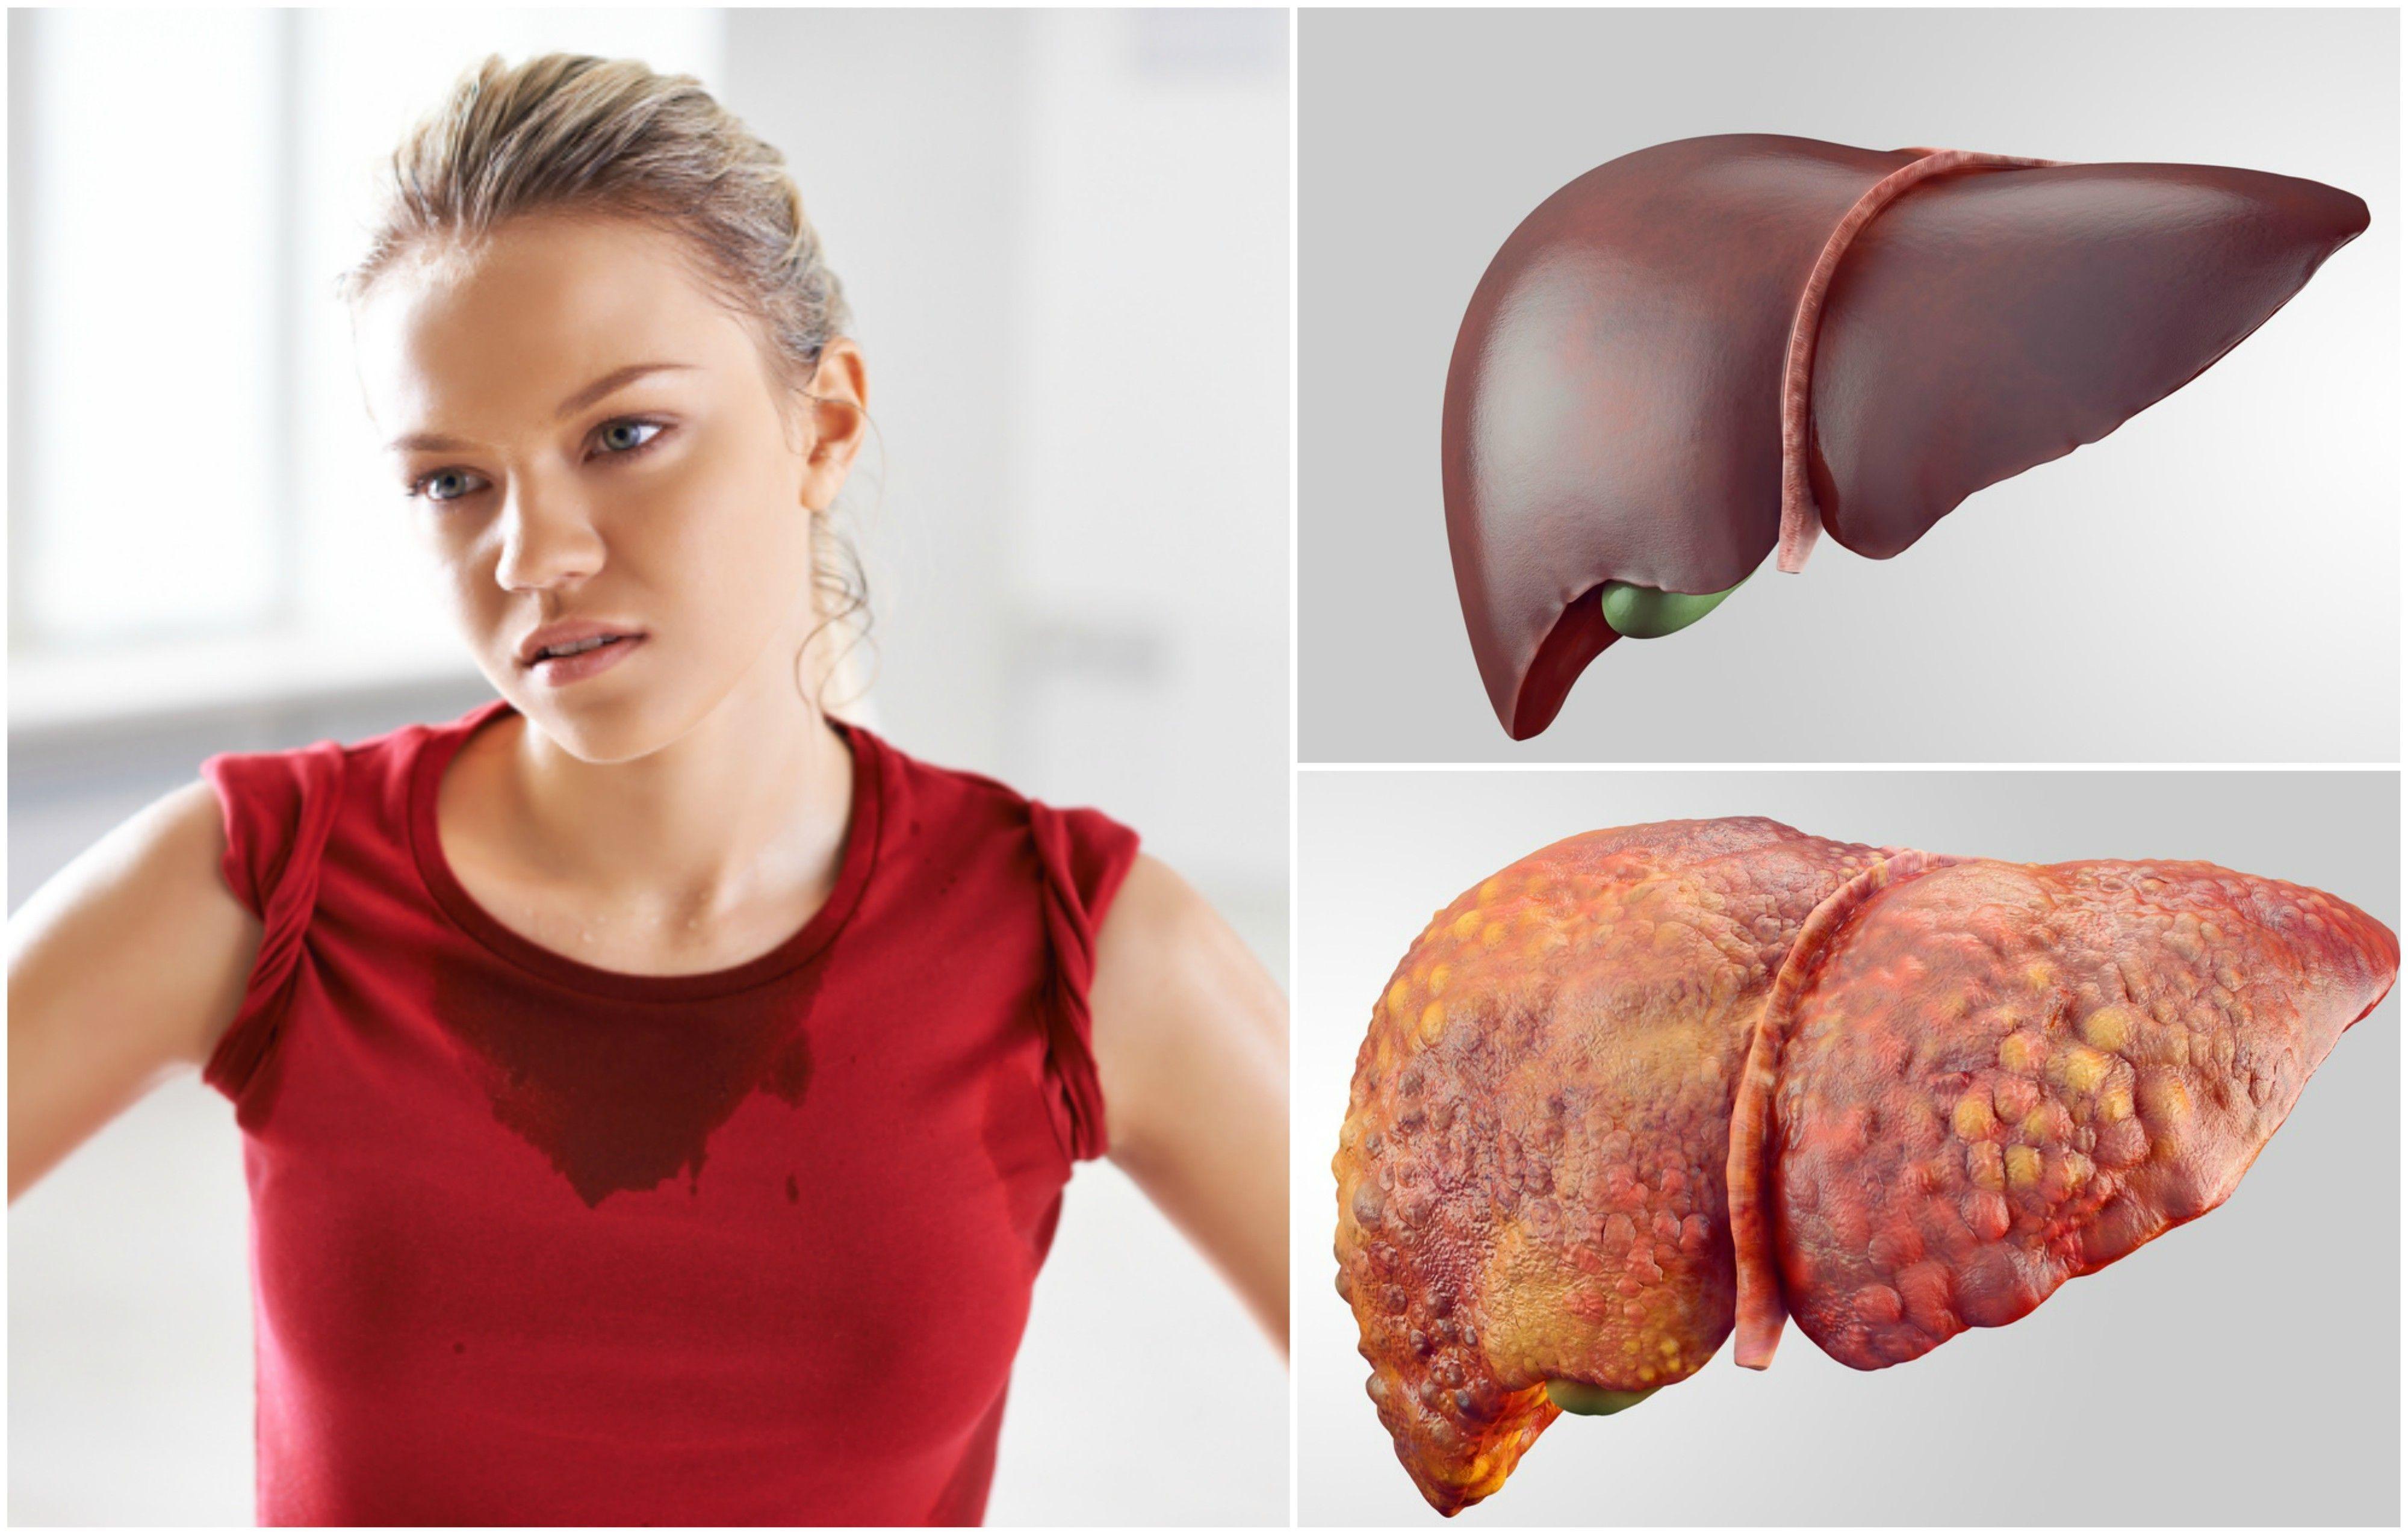 Digestive Problems The Liver Produces Bile A Bitter Alkaline Fluid